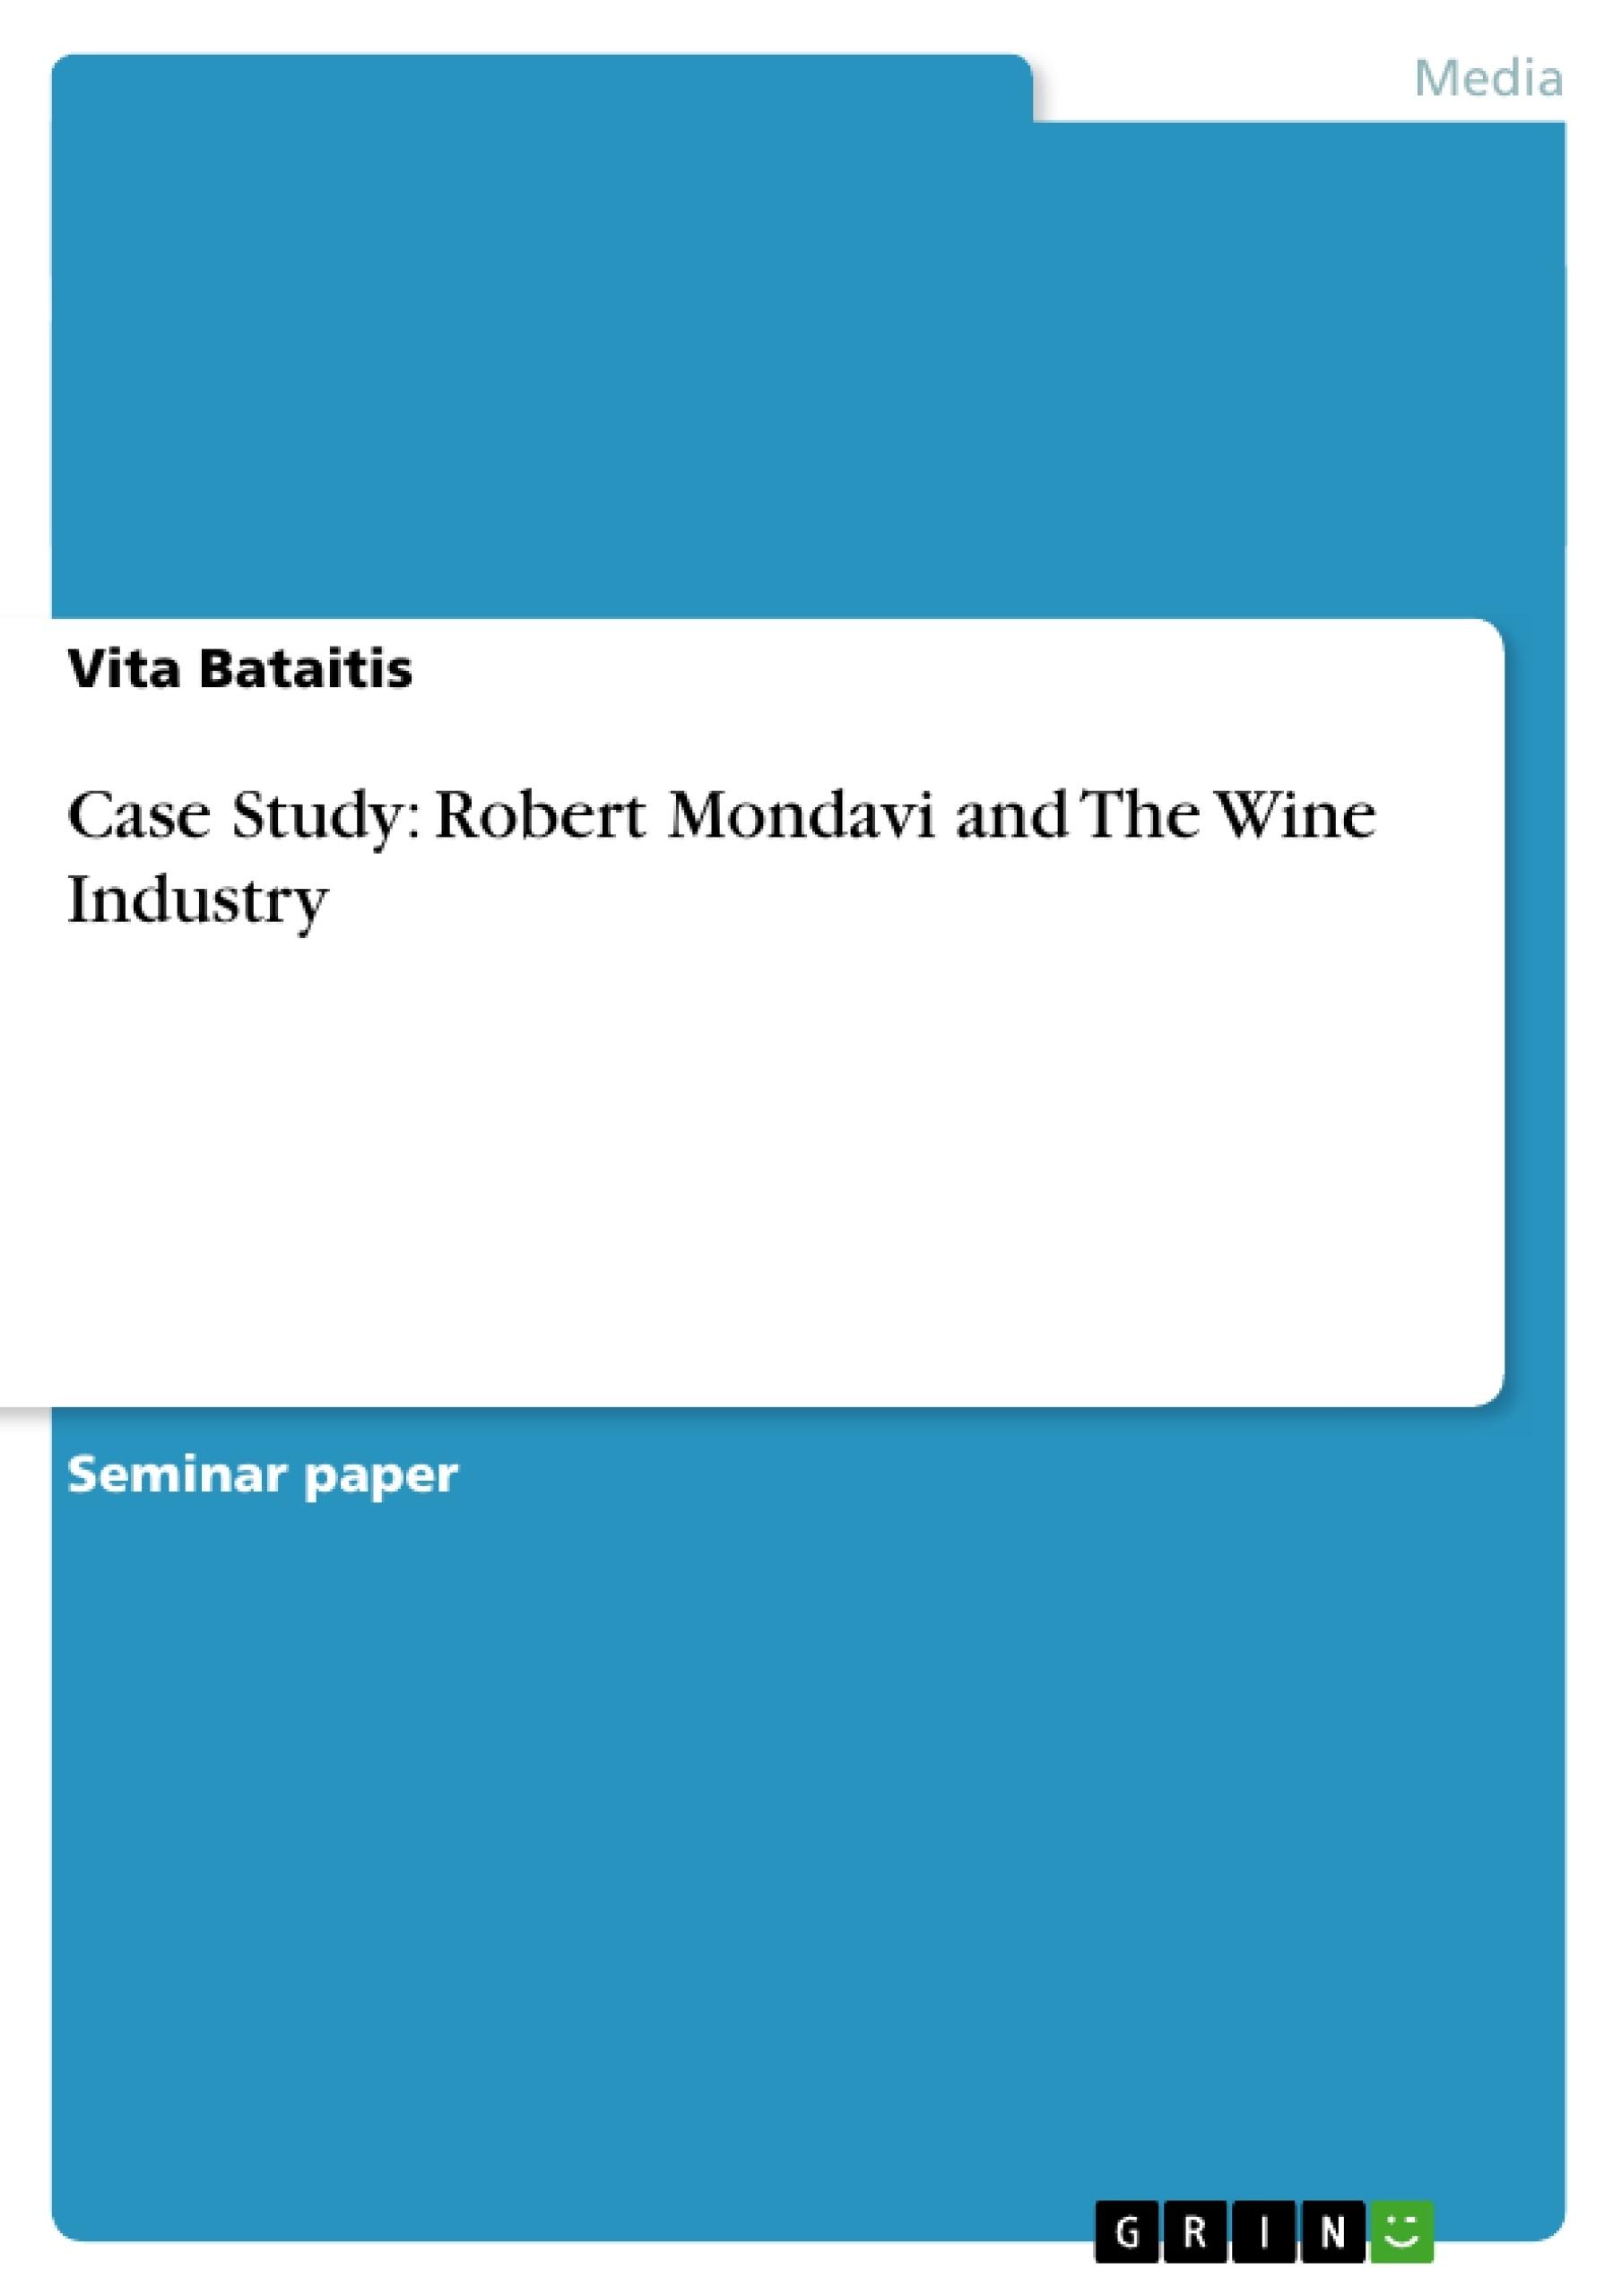 Title: Case Study: Robert Mondavi and The Wine Industry